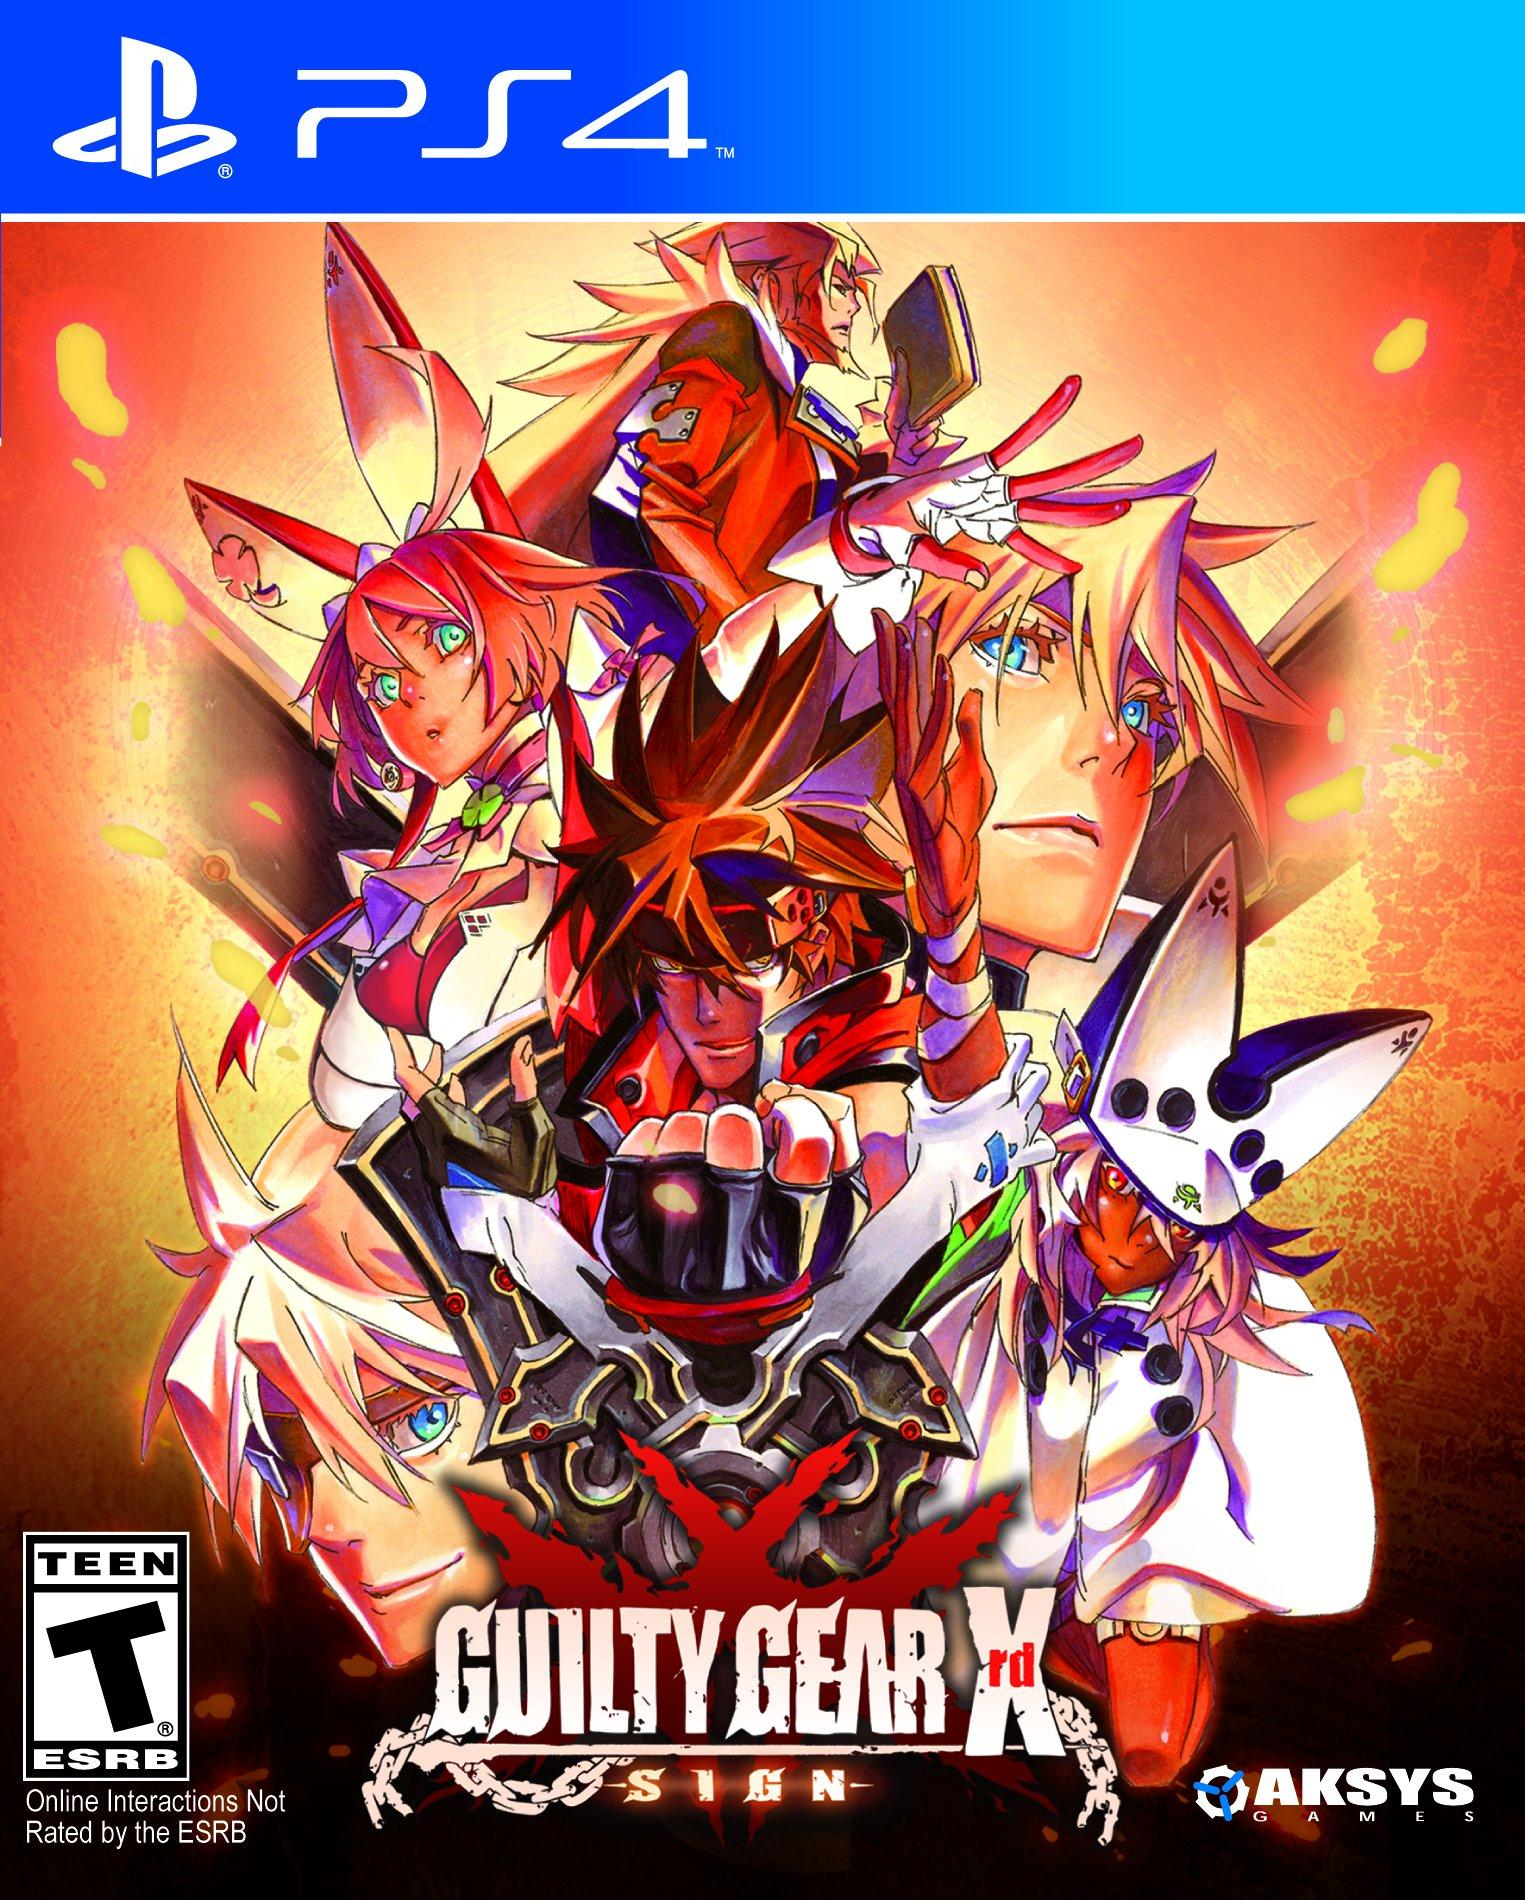 Guilty Gear Xrd Sign Playstation 4 Gamestop